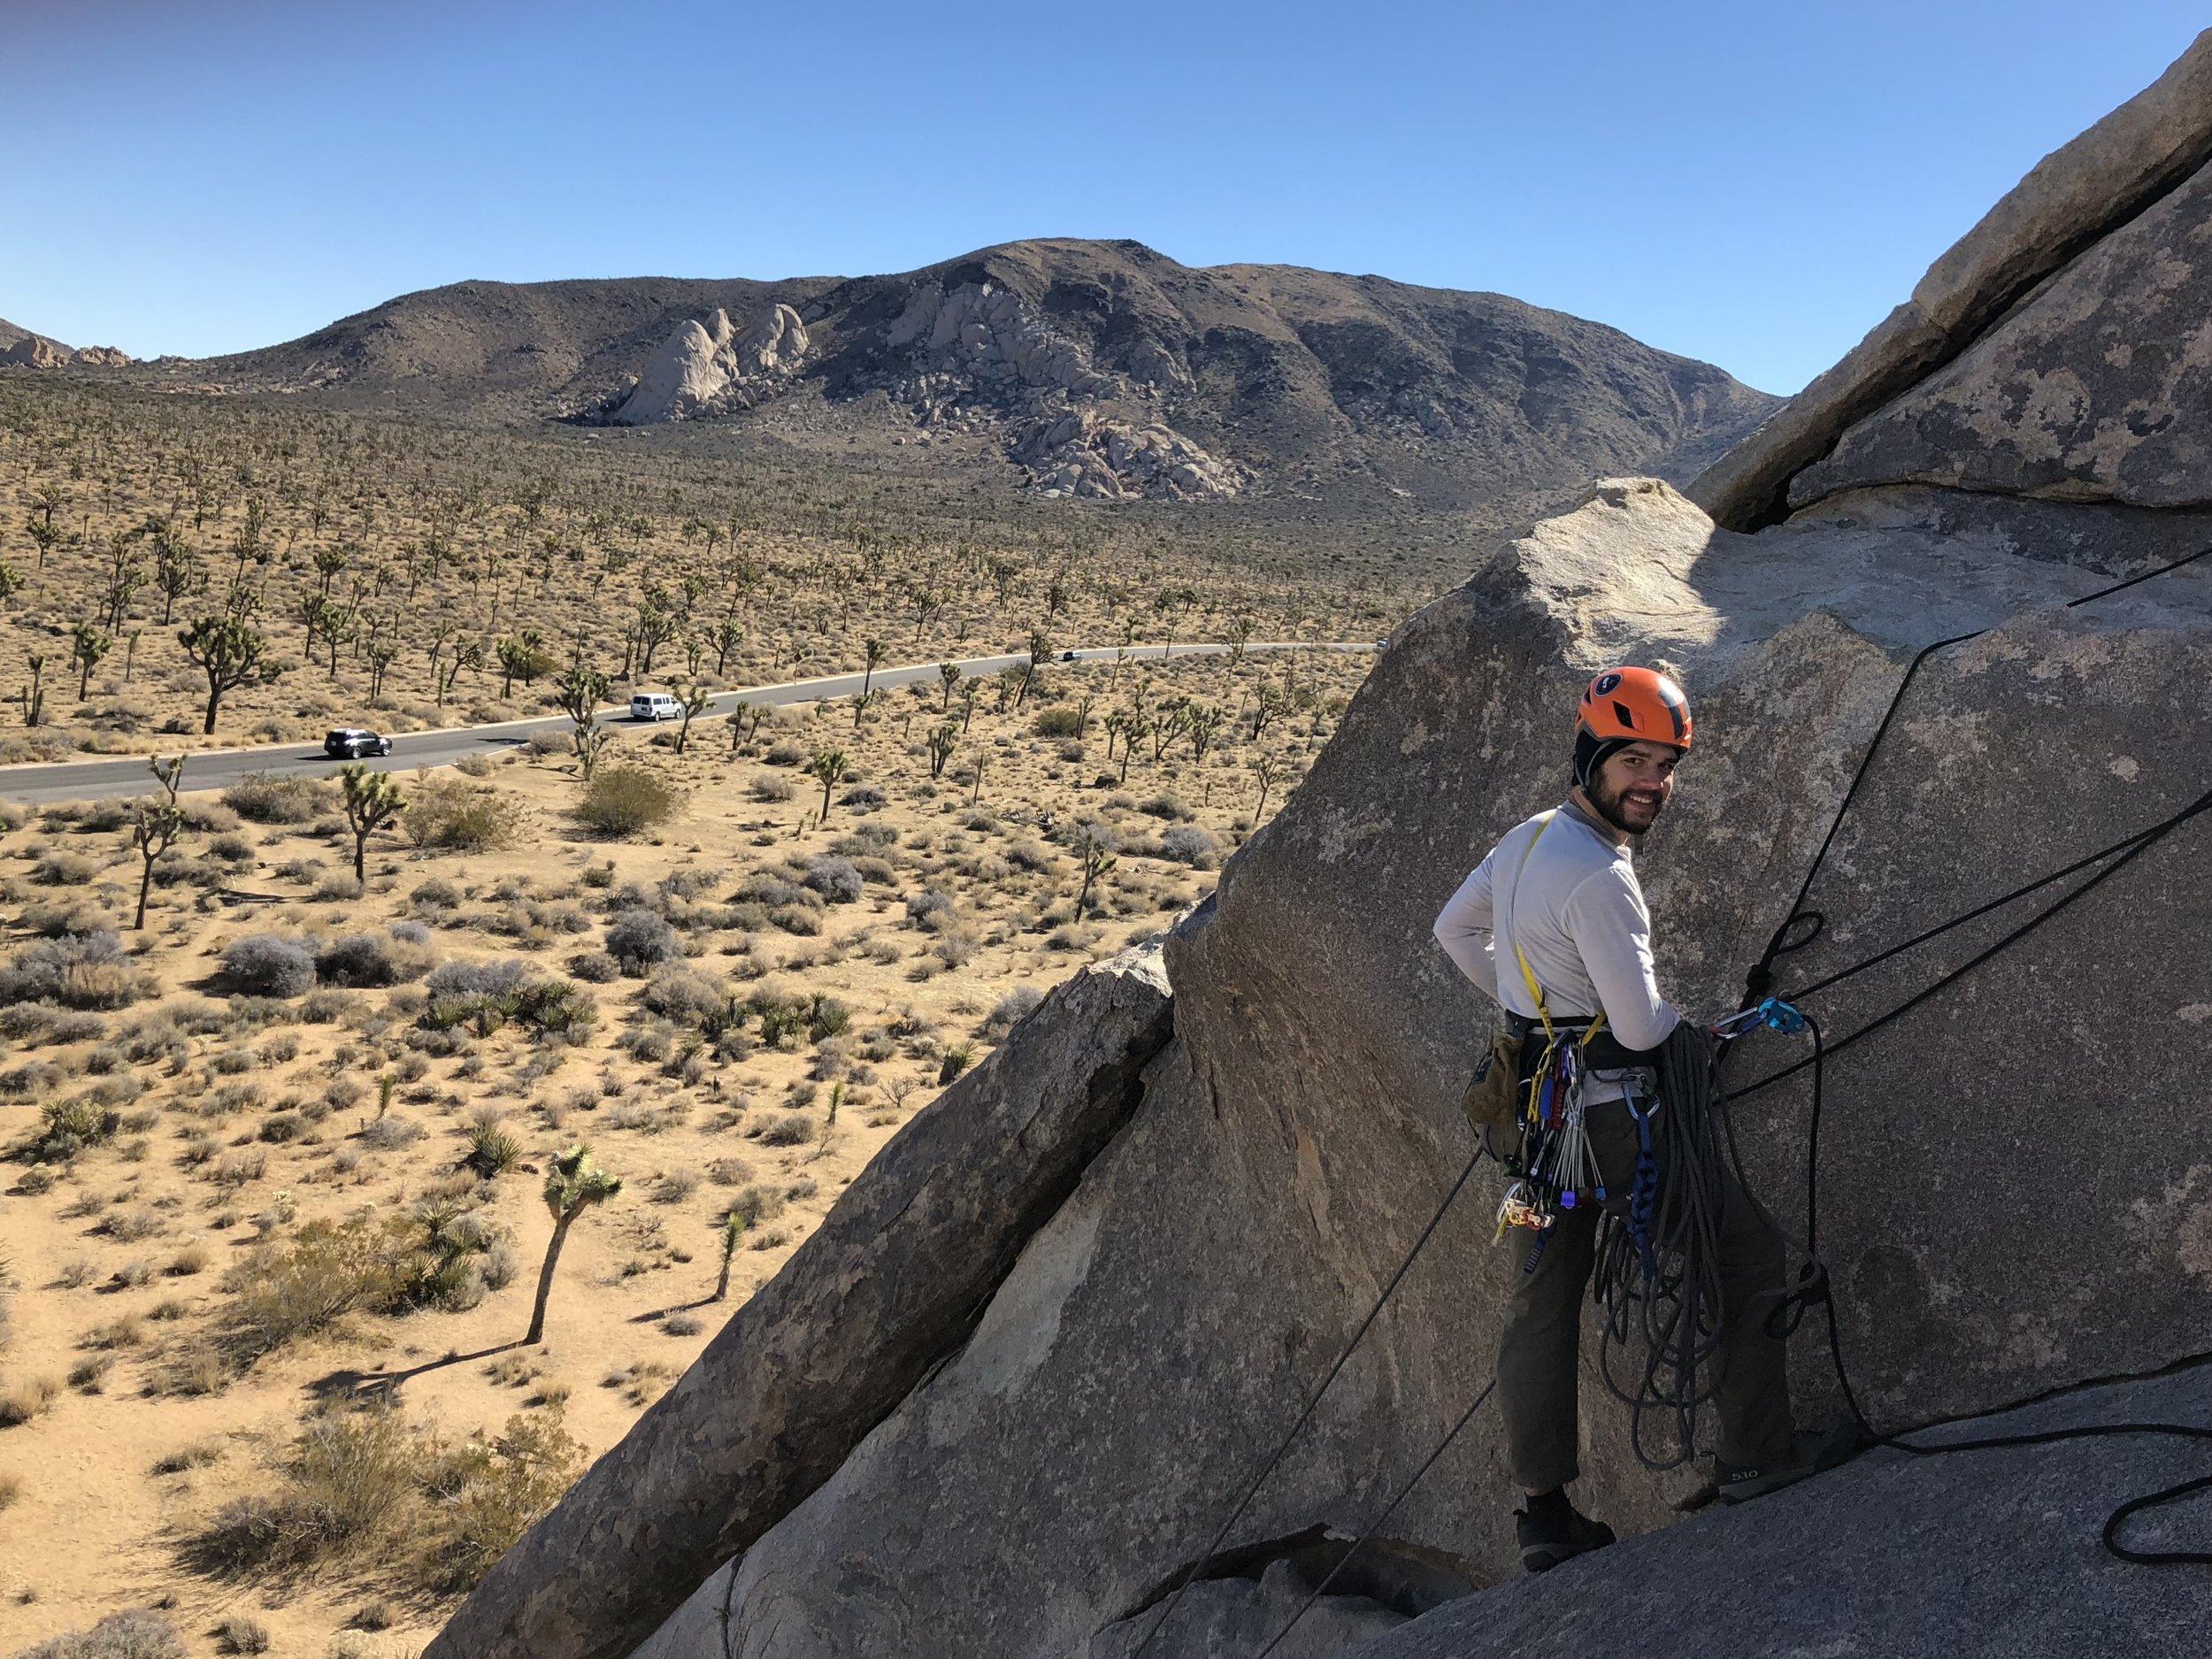 Joshua Tree Advanced Climbing Anchors